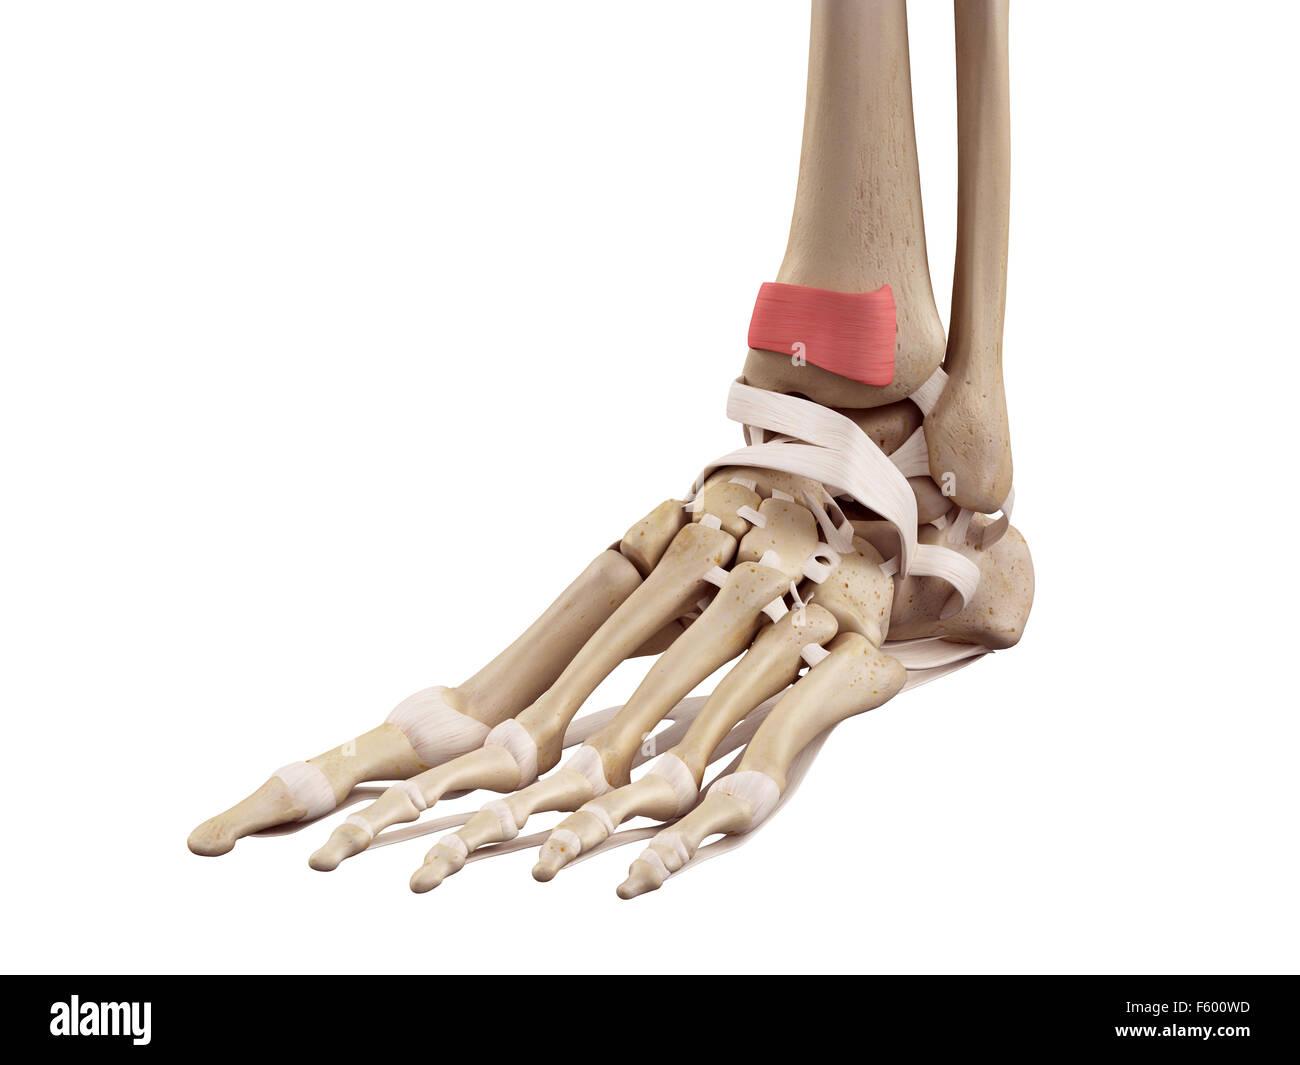 medical accurate illustration of the inferior extensor retinaculum - Stock Image